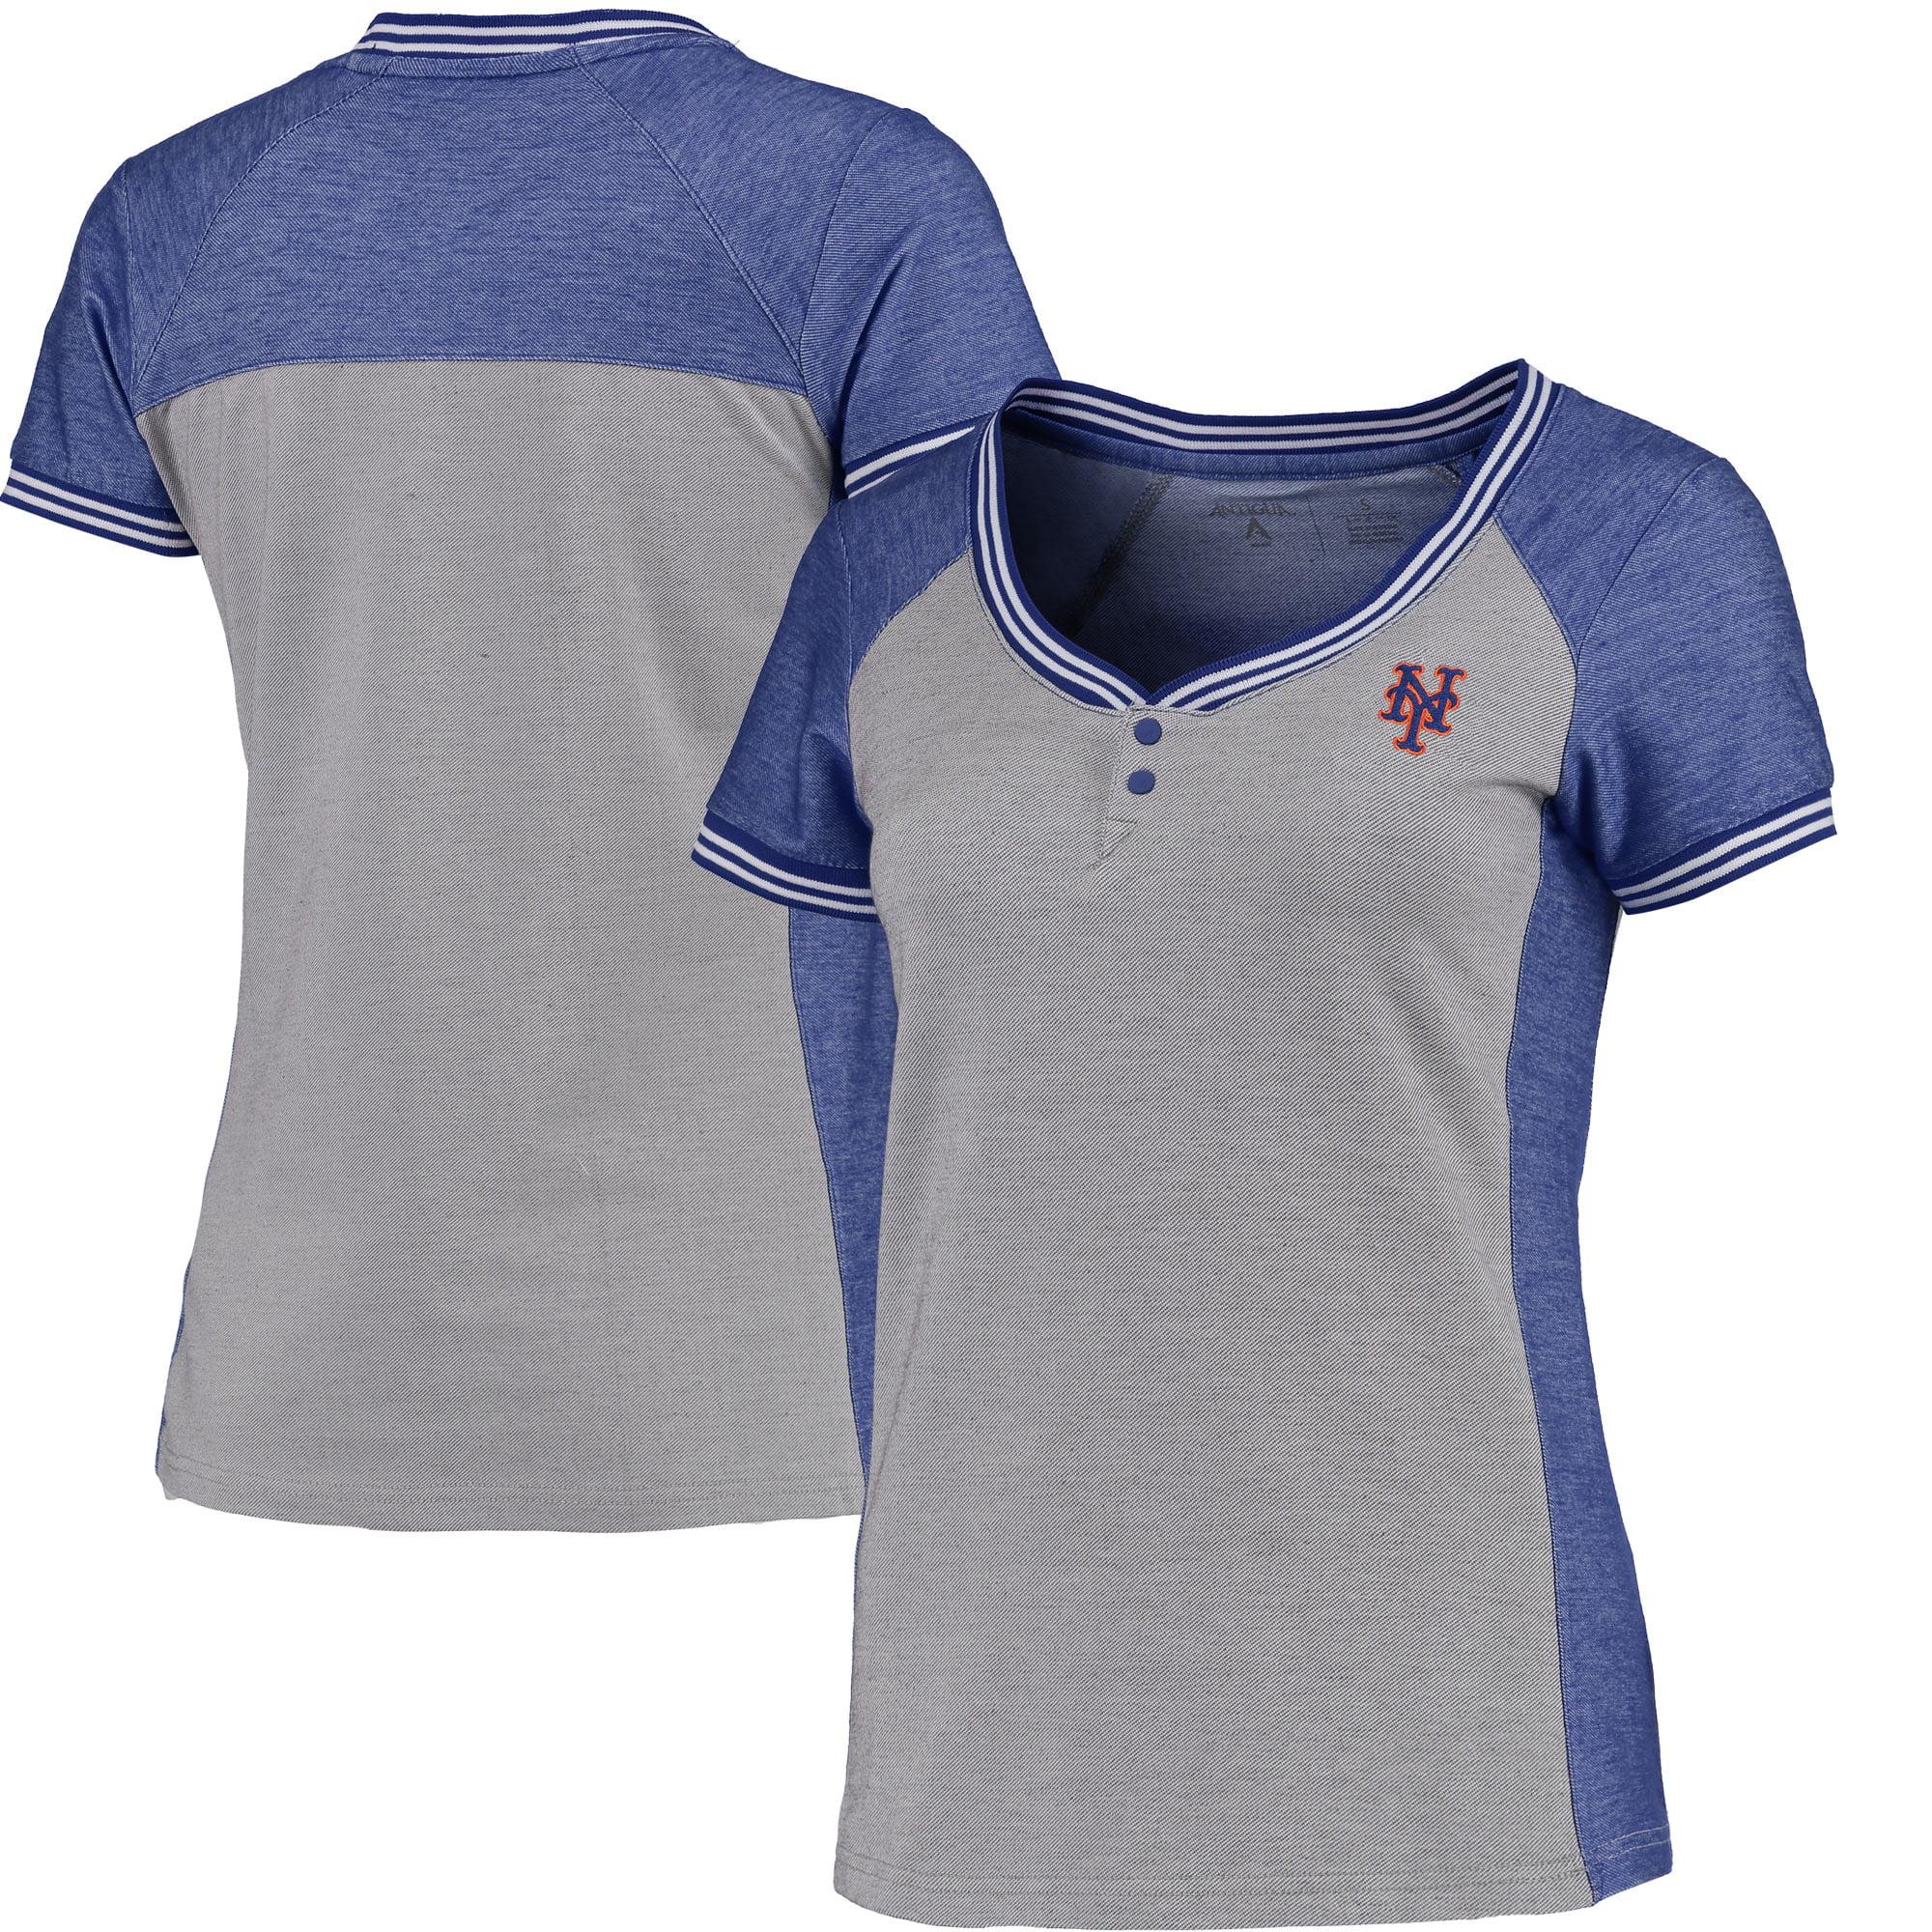 New York Mets Antigua Women's Quick Henley T-Shirt - Gray/Royal